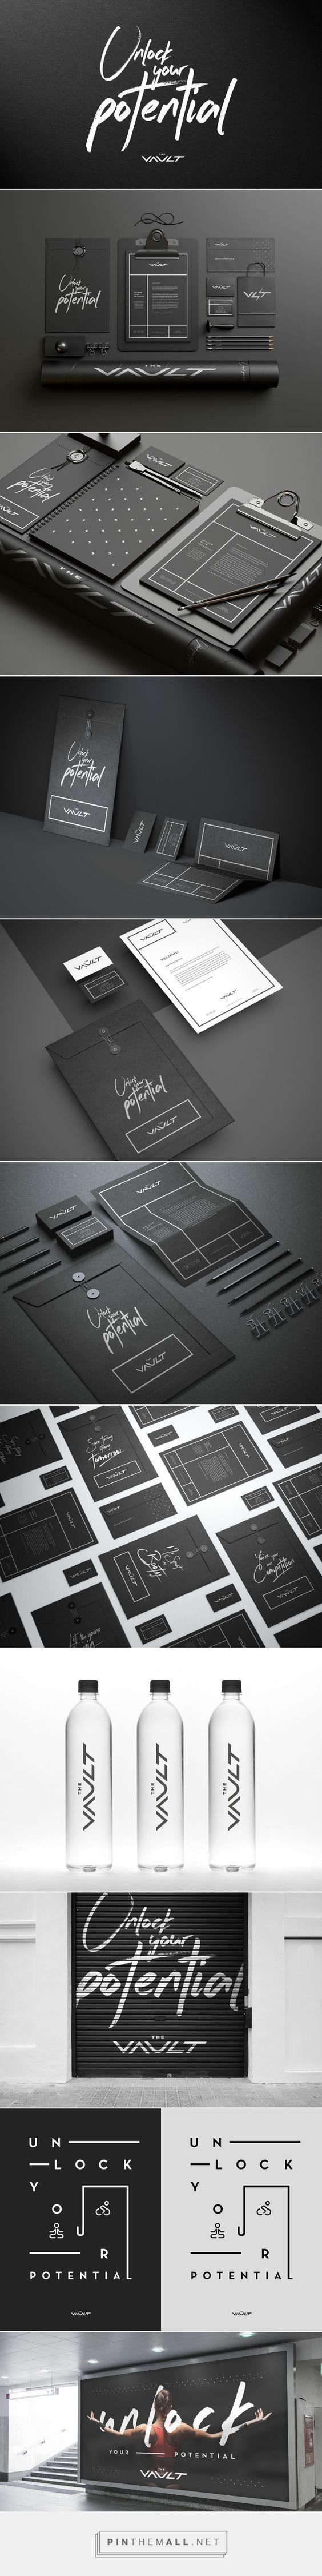 Brand design and ideas   Simple black and white branding inspiration    The Vault Branding on Behance